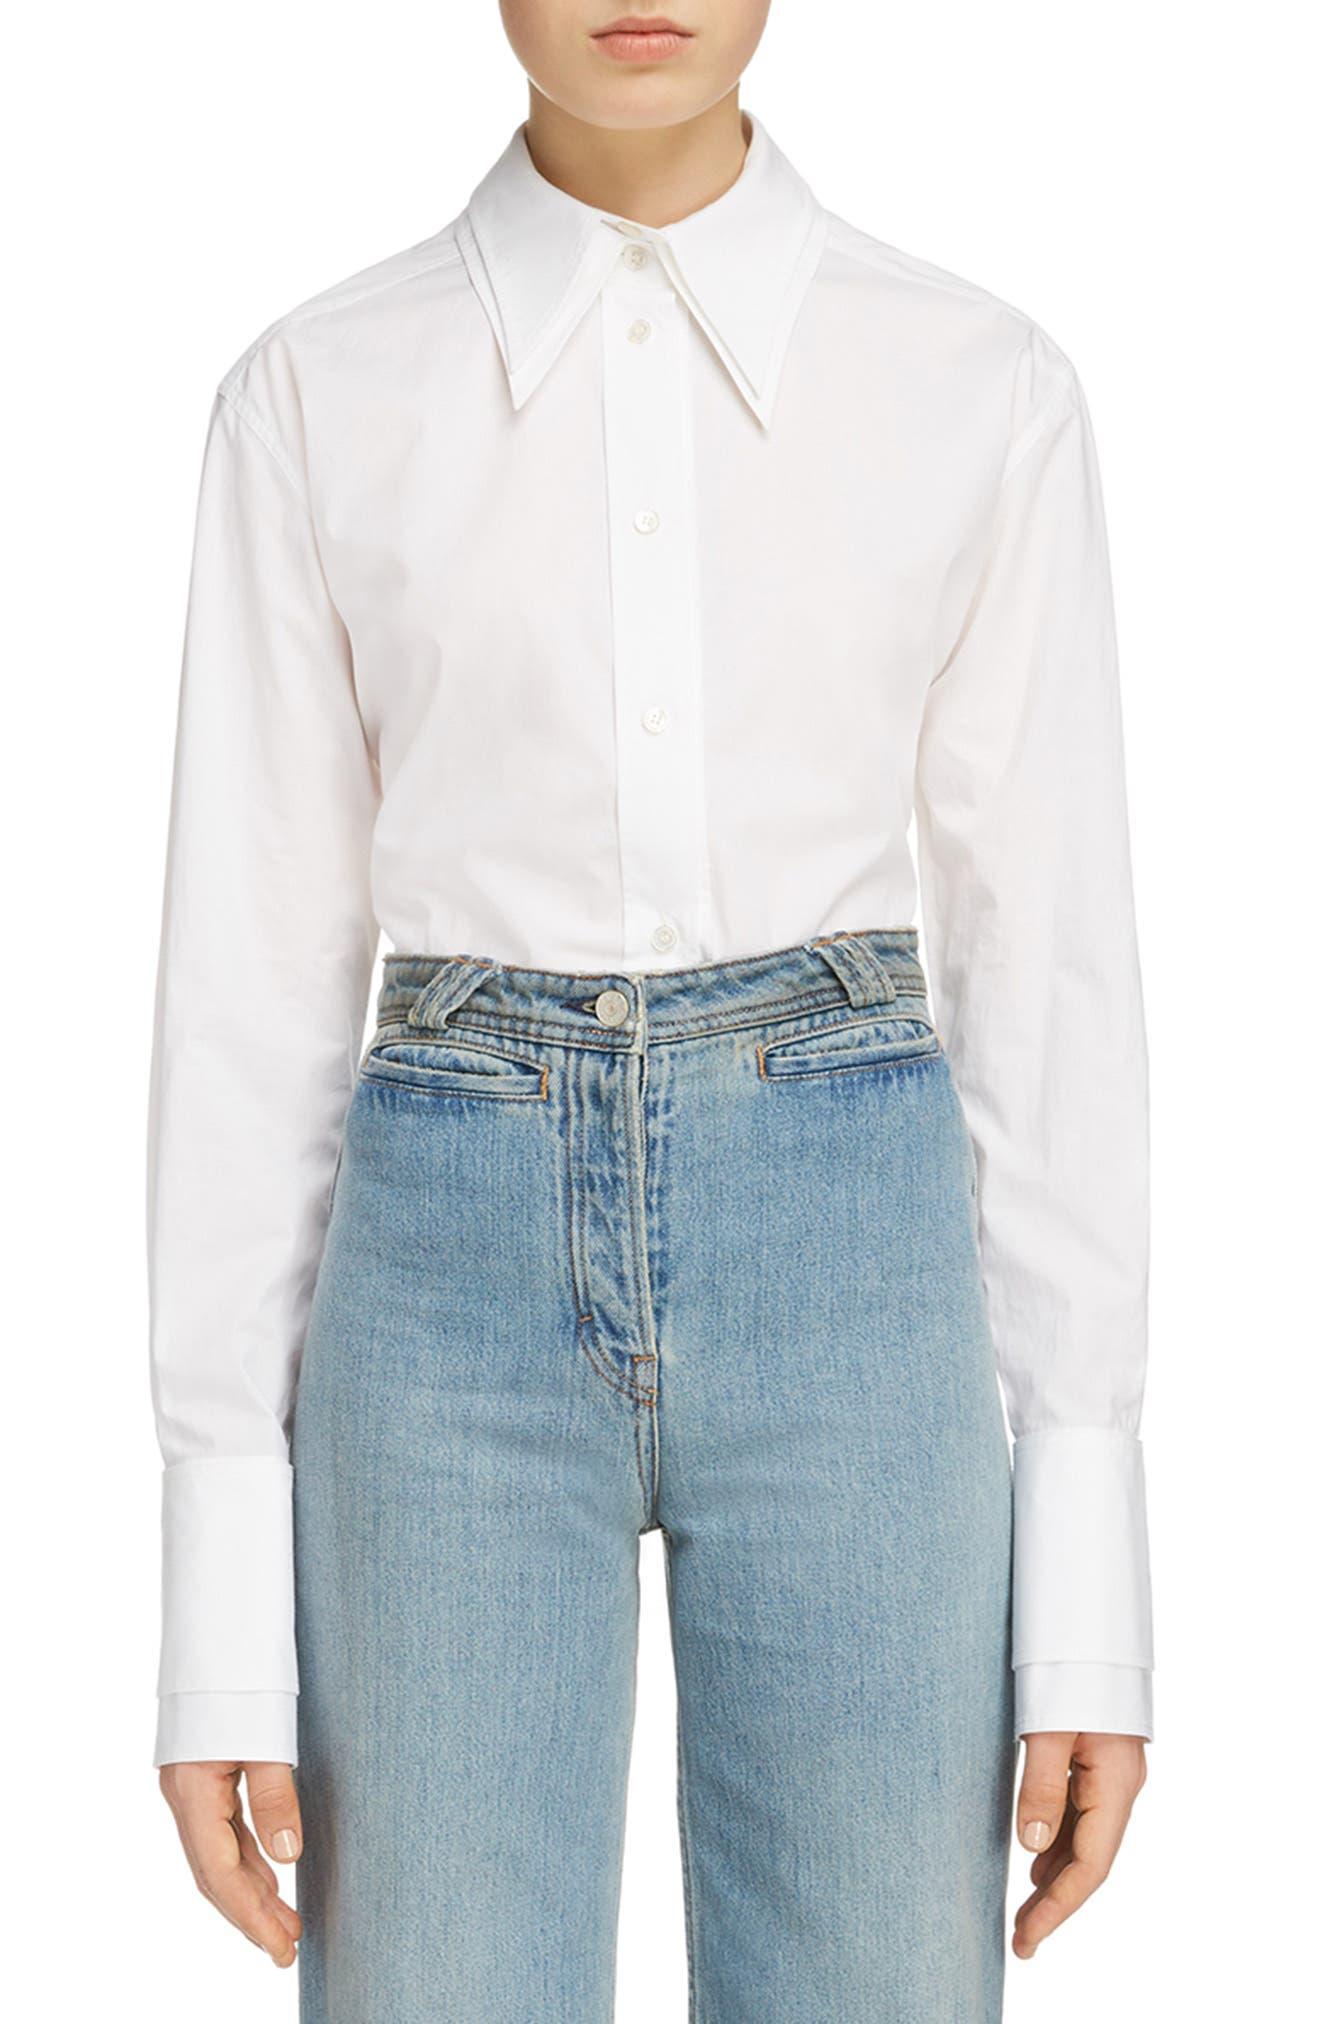 Roline Shirt,                         Main,                         color, 100